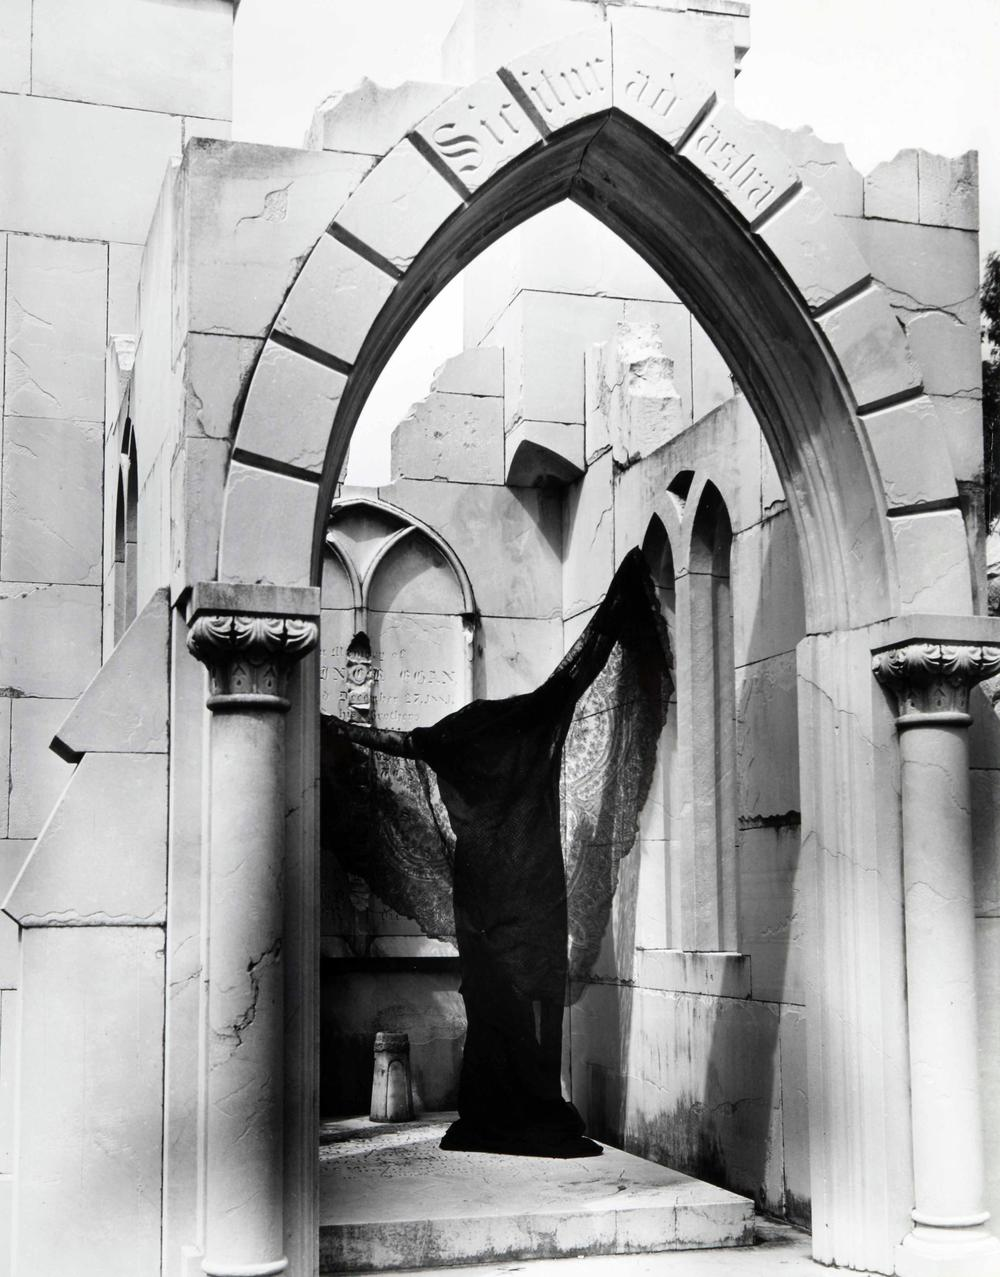 Clarence John Laughlin (American, 1905-1985), The Bat, 1940, gelatin silver print. High Museum of Art, Atlanta, gift of Lucinda W. Bunnen for the Bunnen Collection, 1981.93.